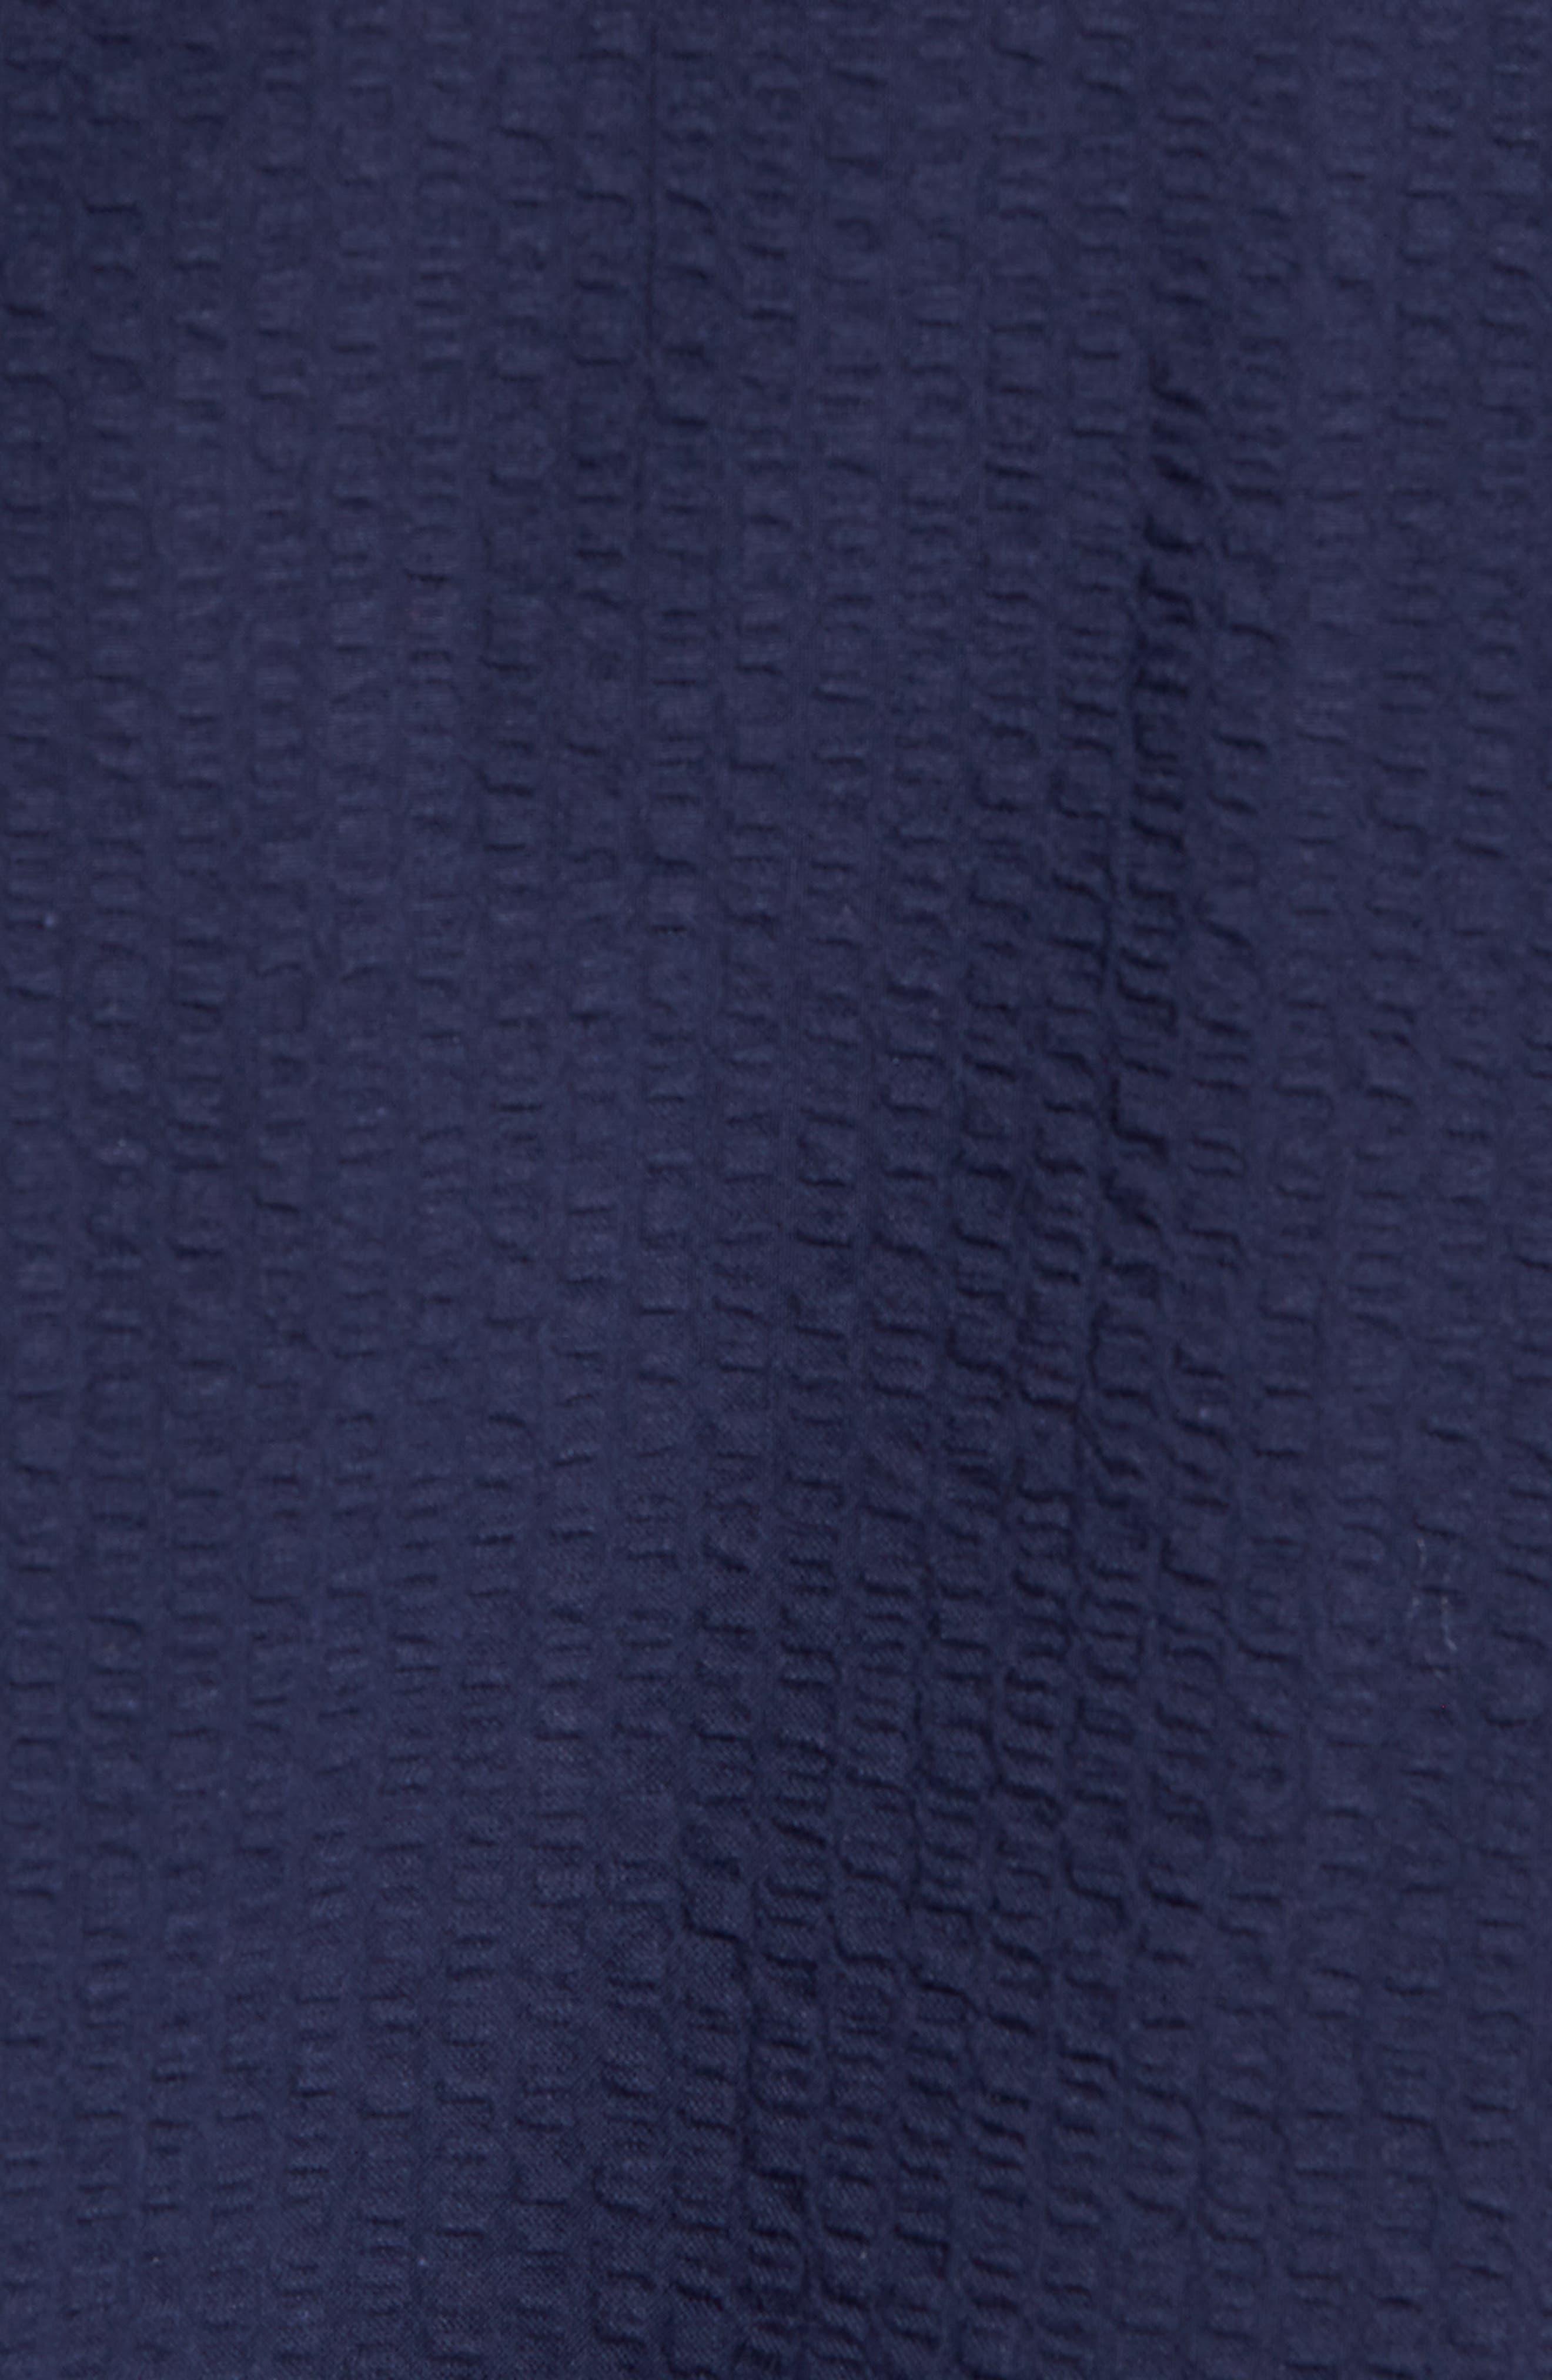 Trim Fit Seersucker Sport Shirt,                             Alternate thumbnail 5, color,                             Navy Iris Seersucker